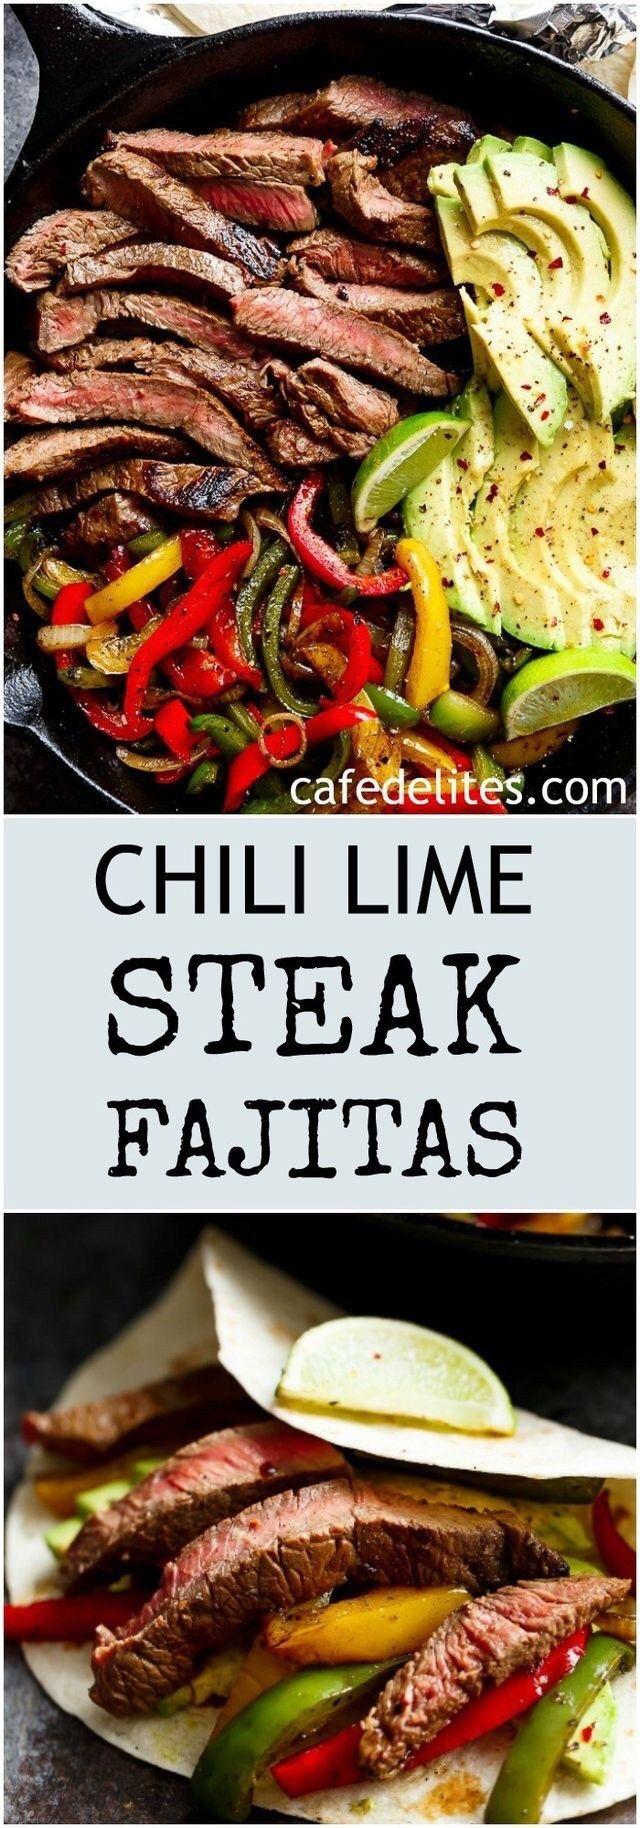 13 Fantastic Fajita Recipes: Authentic Mexican Food #beeffajitarecipe